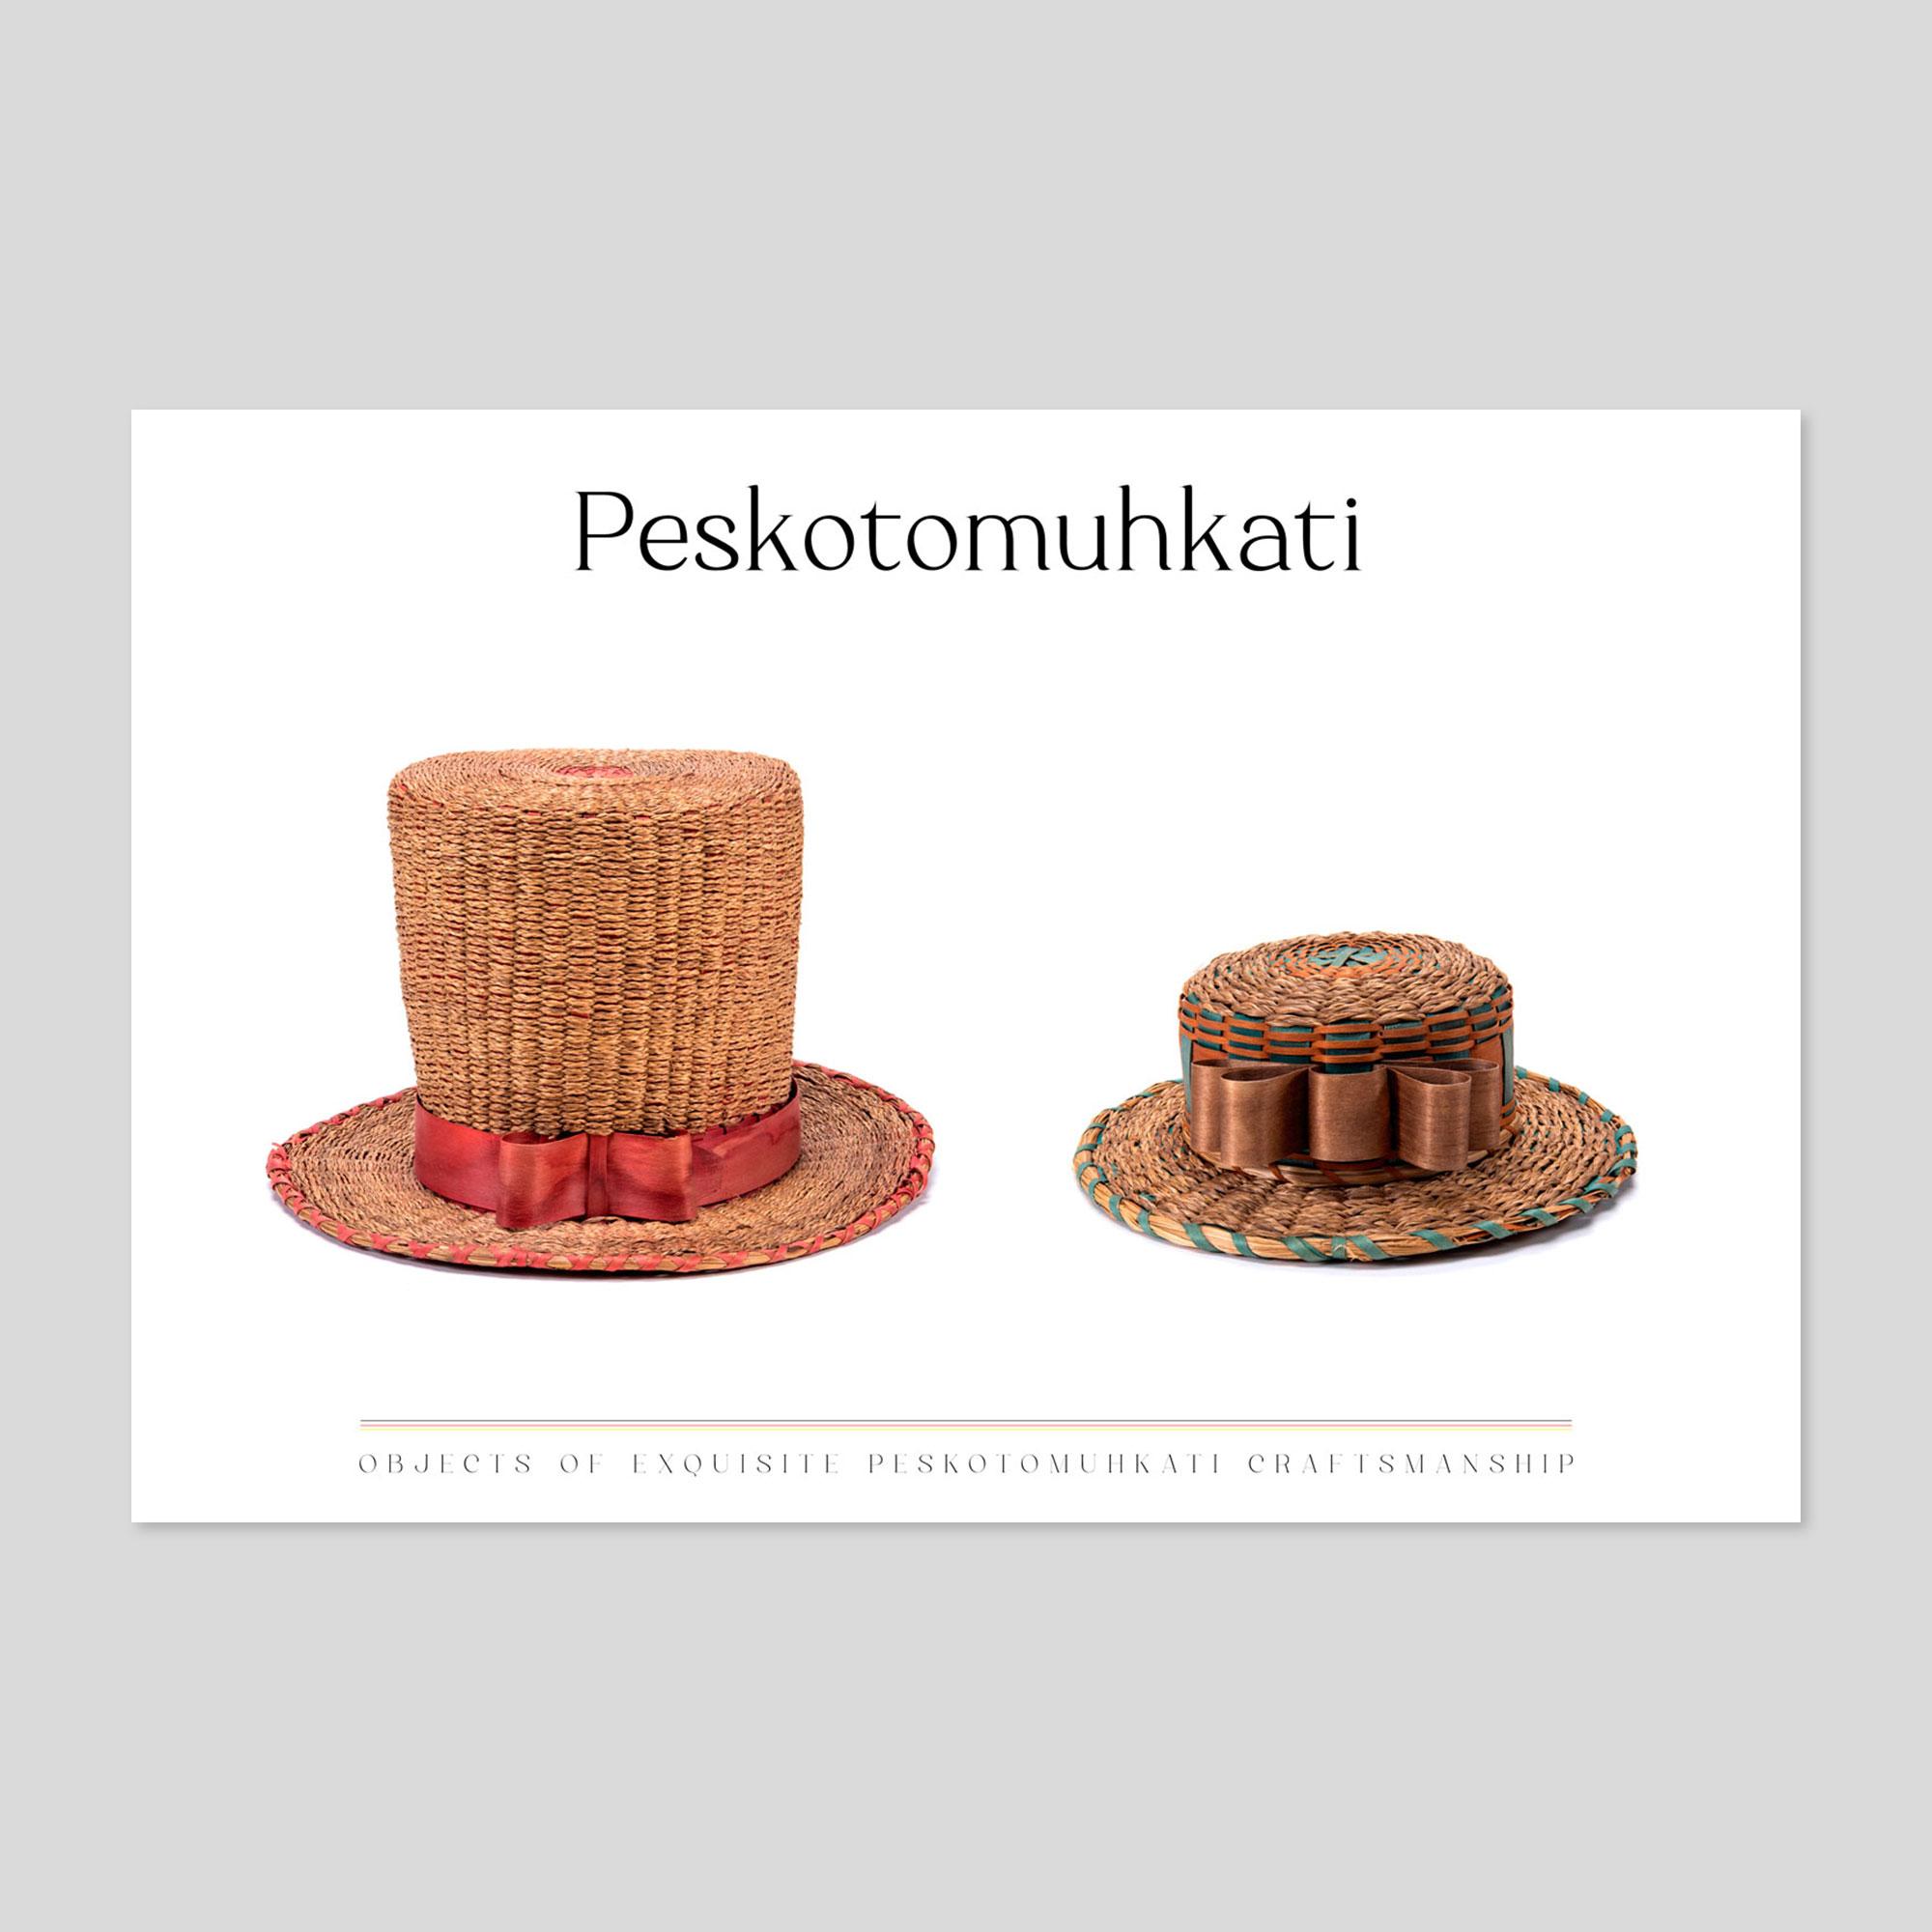 008-peskotomuhkati-sweetgrass-top-hat-suwitokolasi-ahsusuwon-web